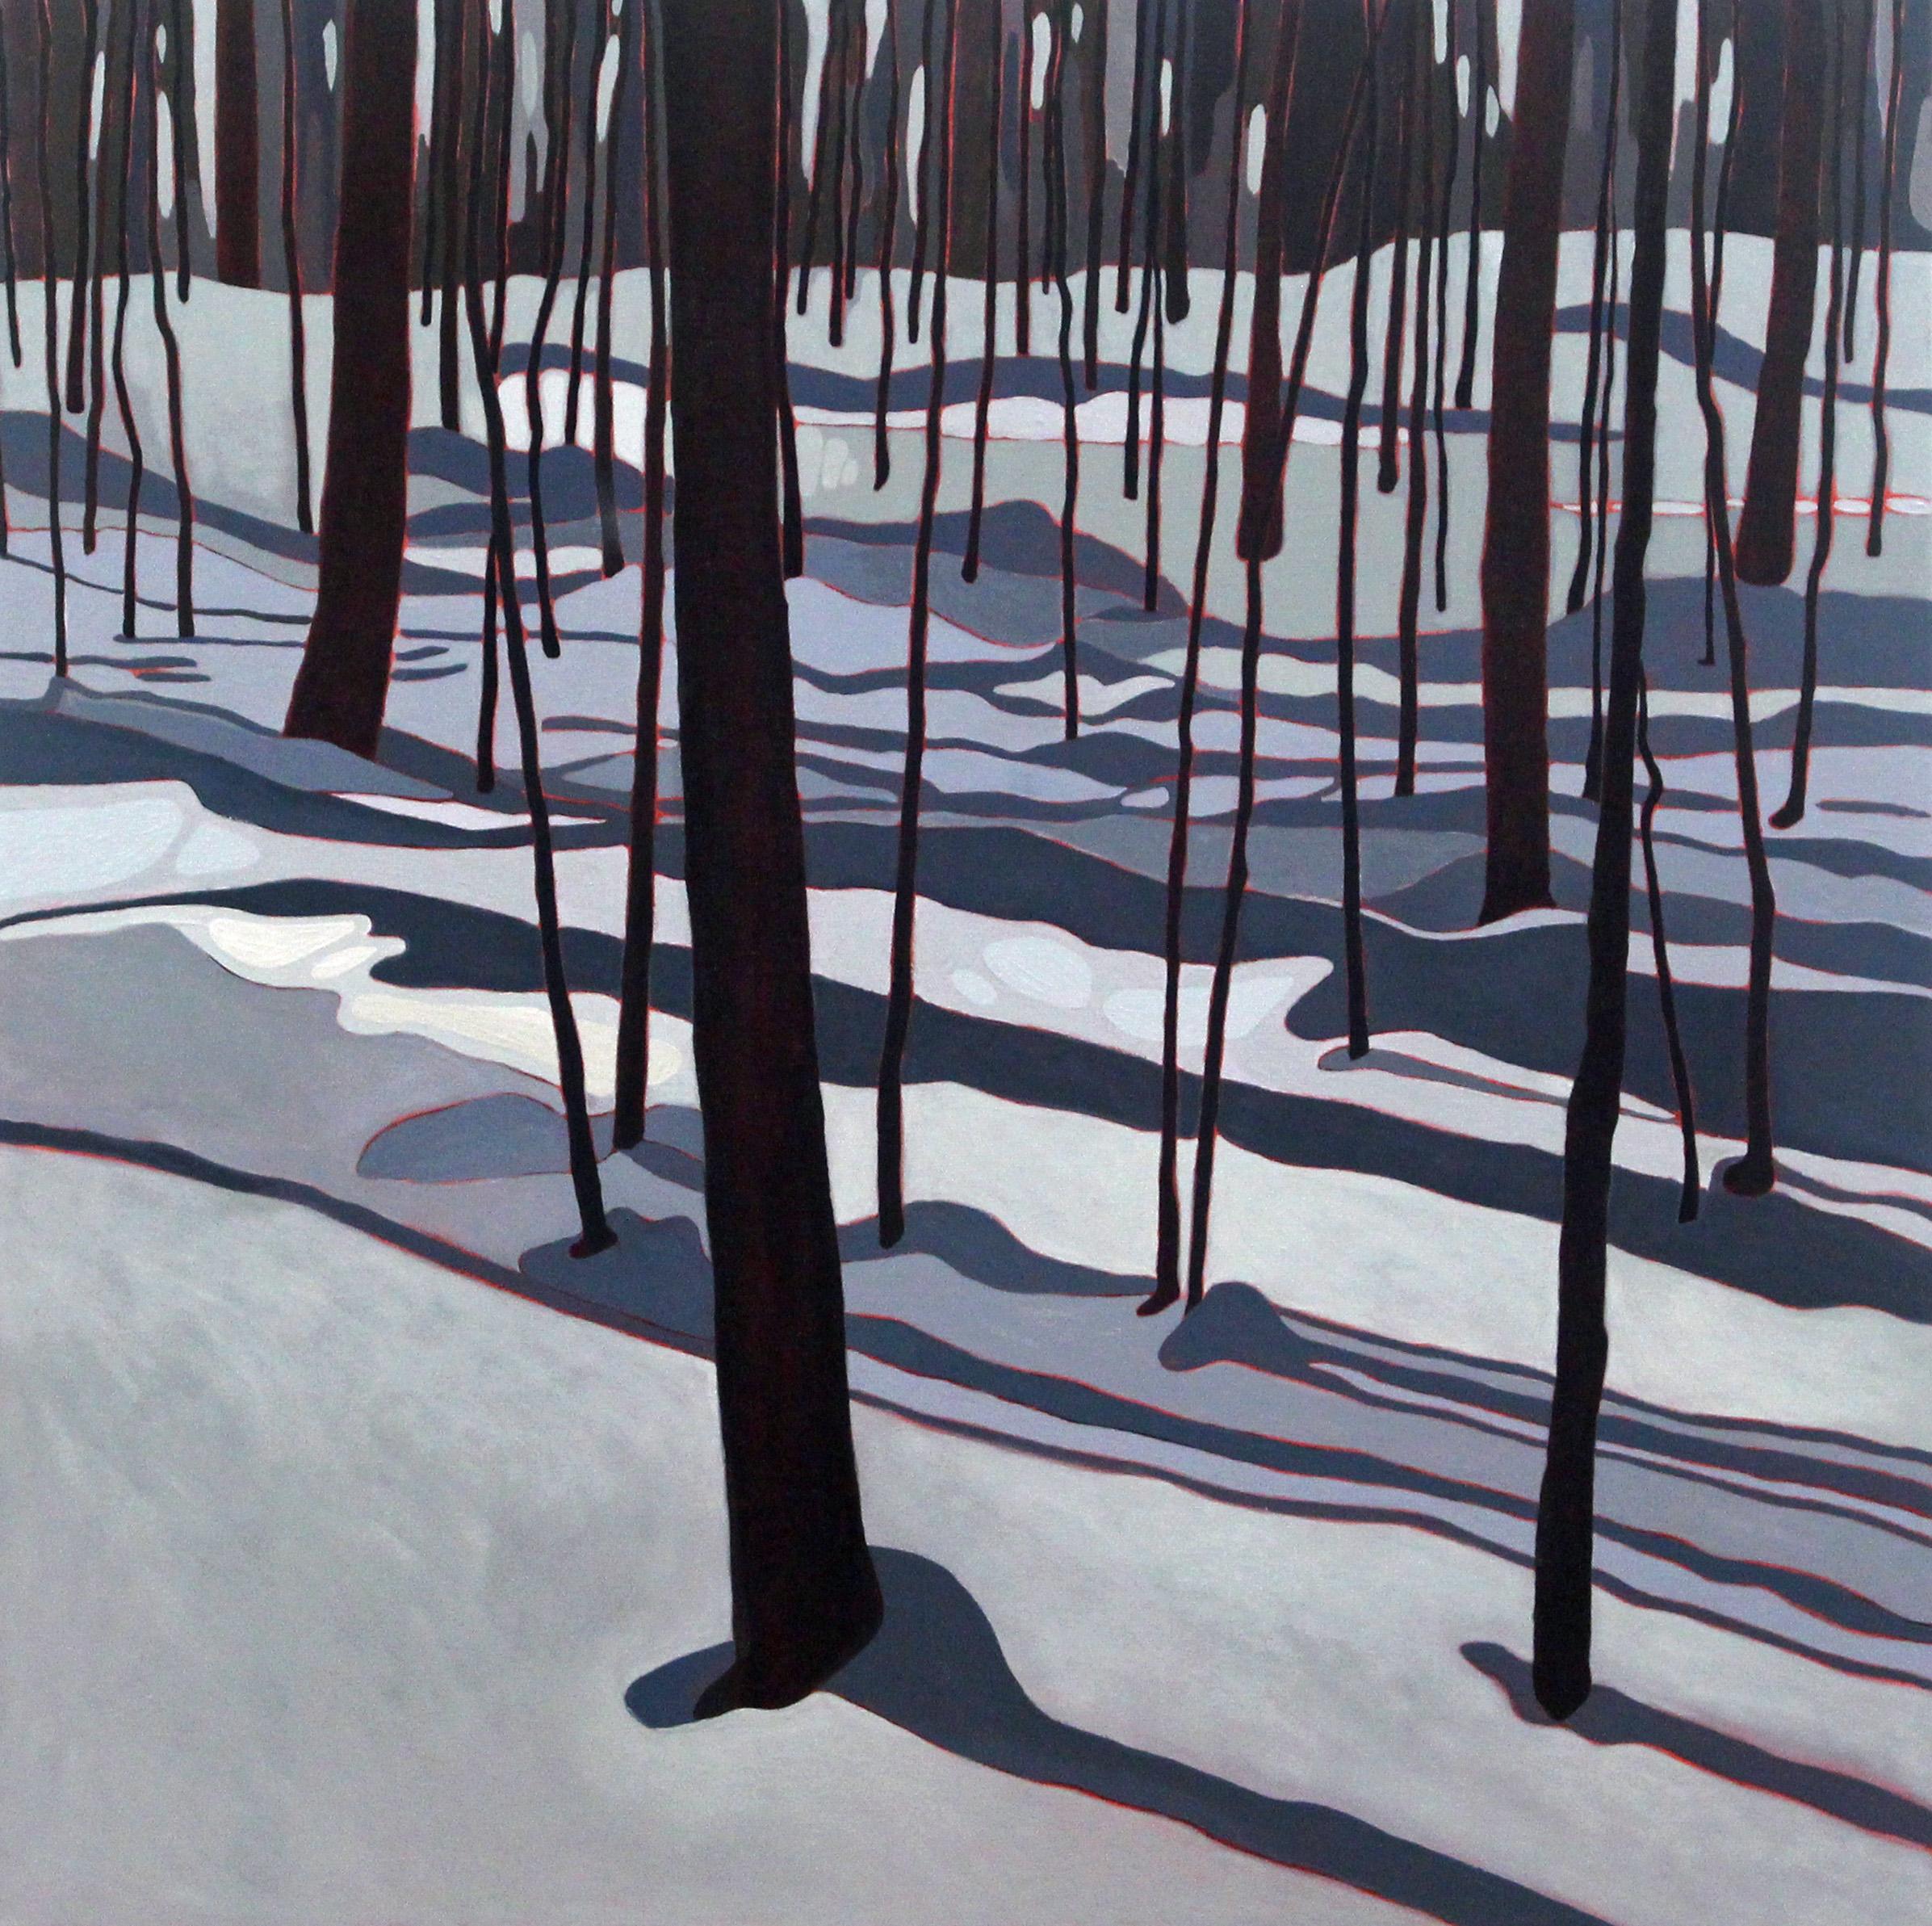 Winter Shadows, 2019, 24 x 24, Acrylic on Canvas